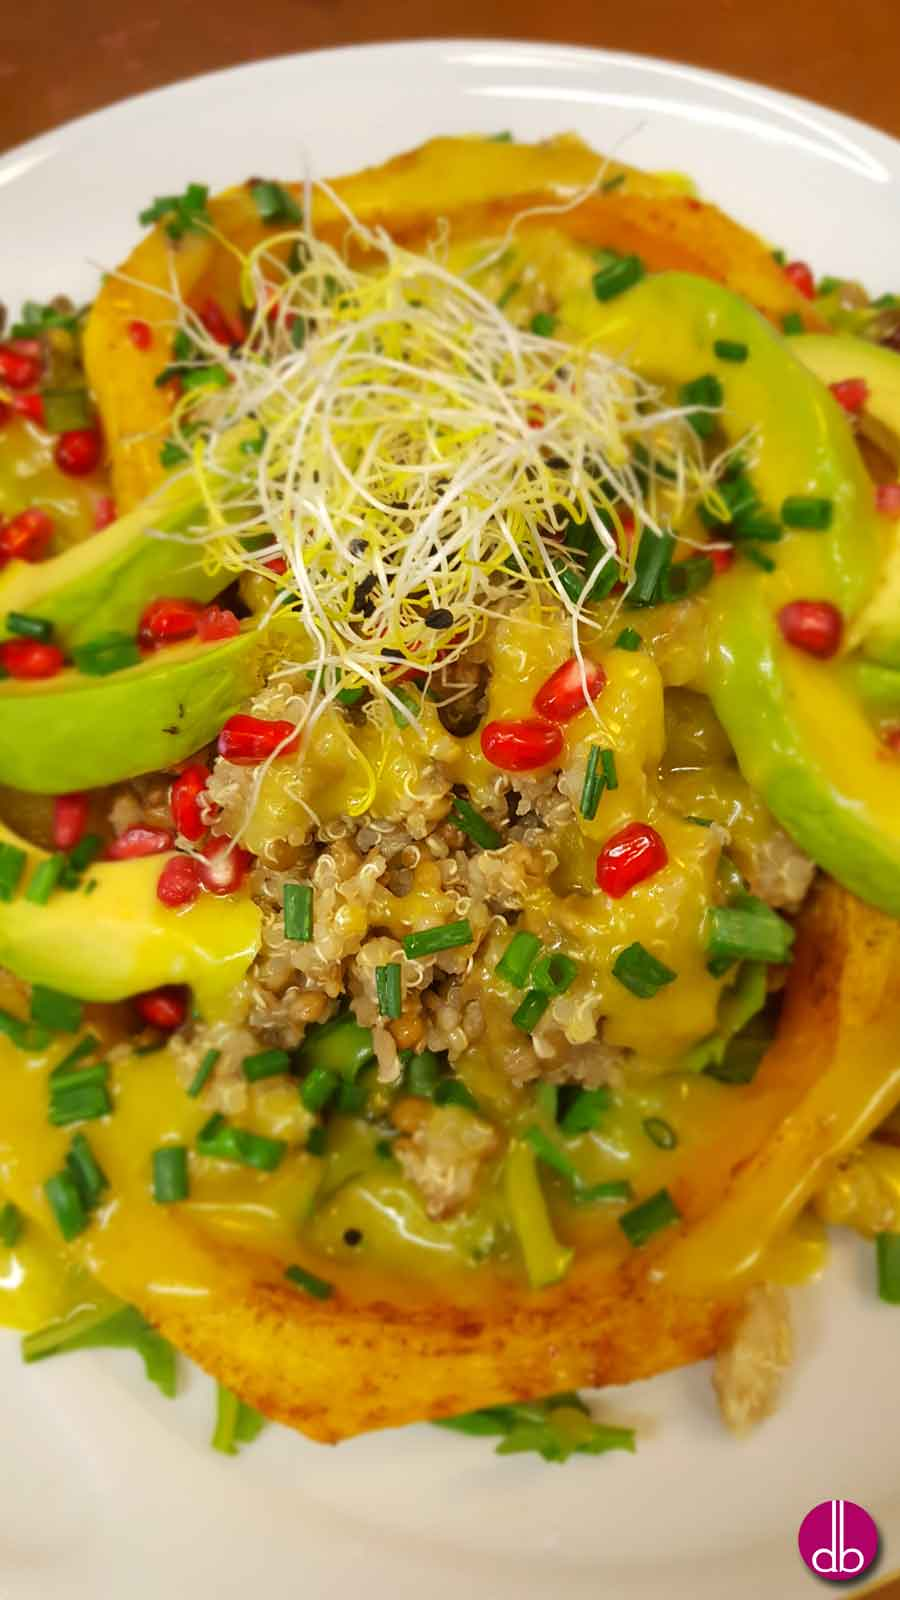 Rezept: vegan Kürbisbowl lit Linsen-Quinoa und Avocado-Dressing